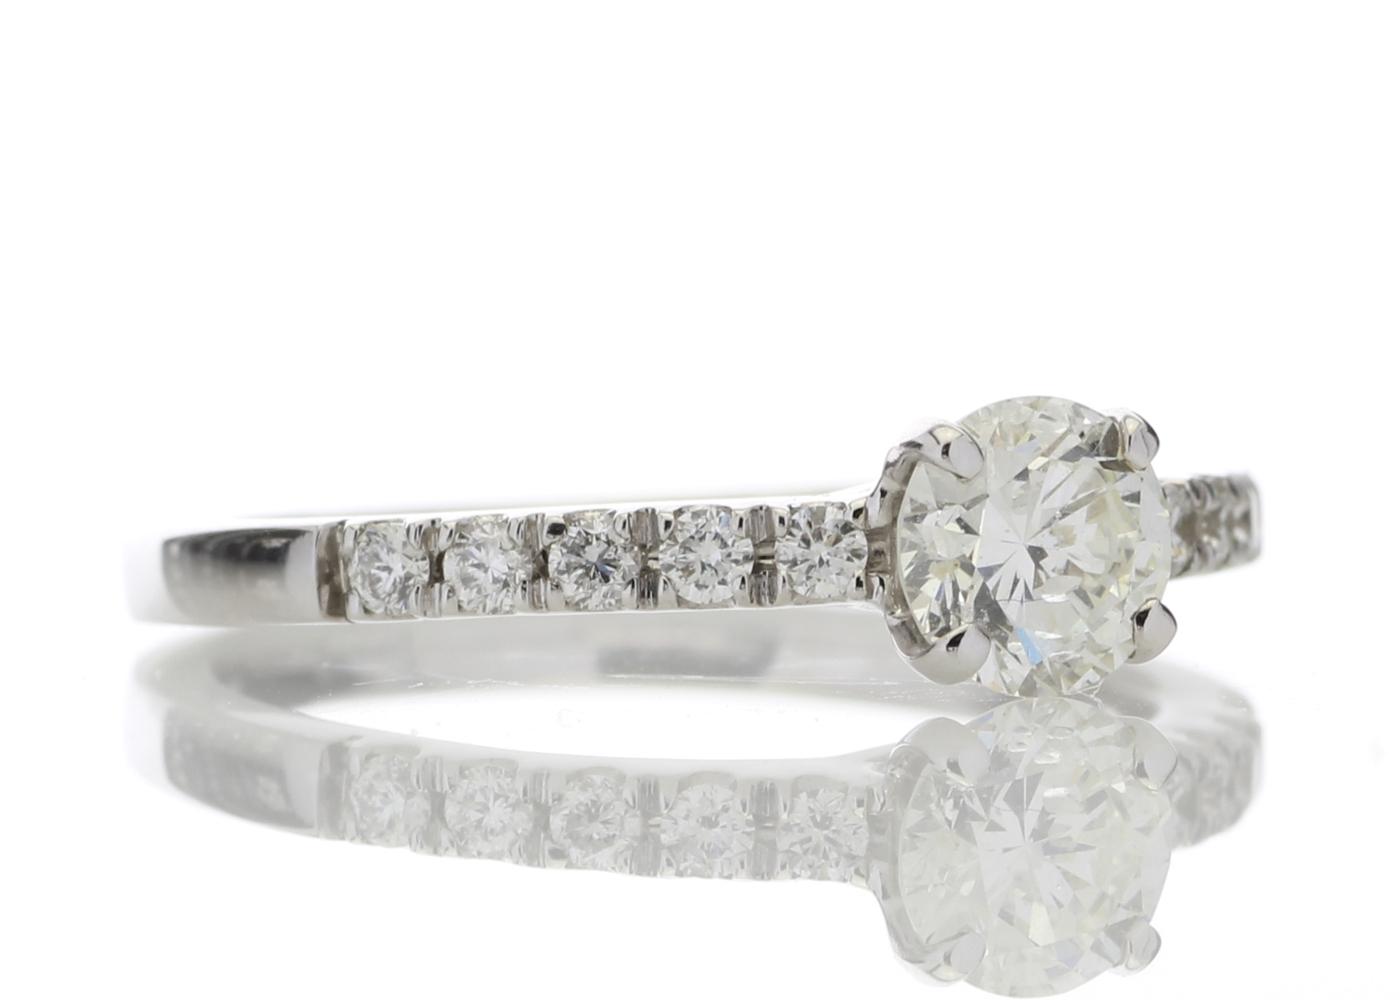 18ct Stone Set Shoulders Diamond Ring 0.69 Carats - Image 4 of 5